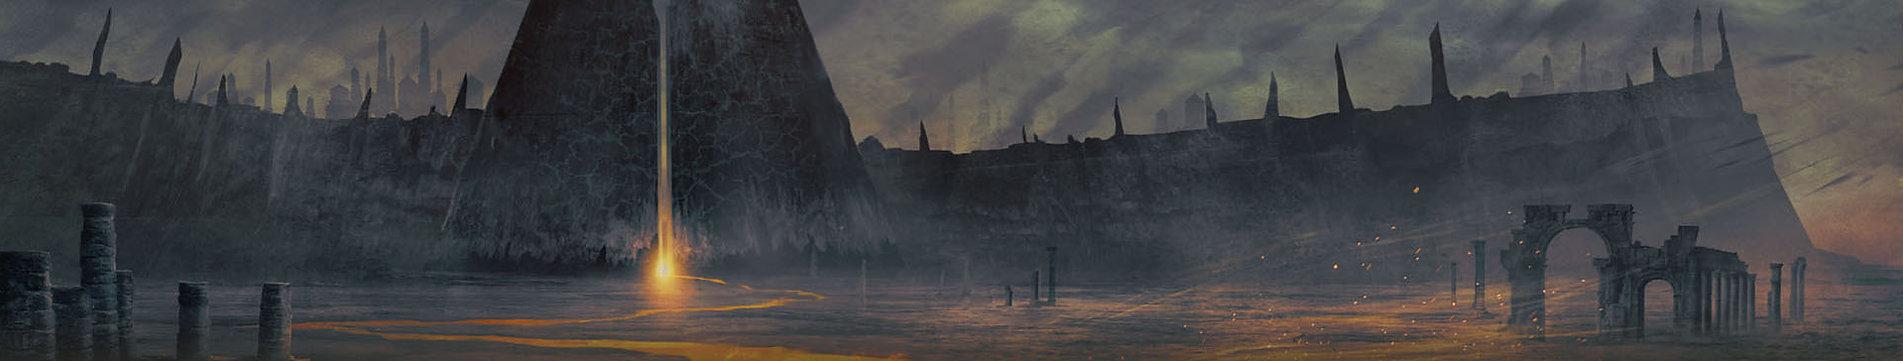 greek underworld